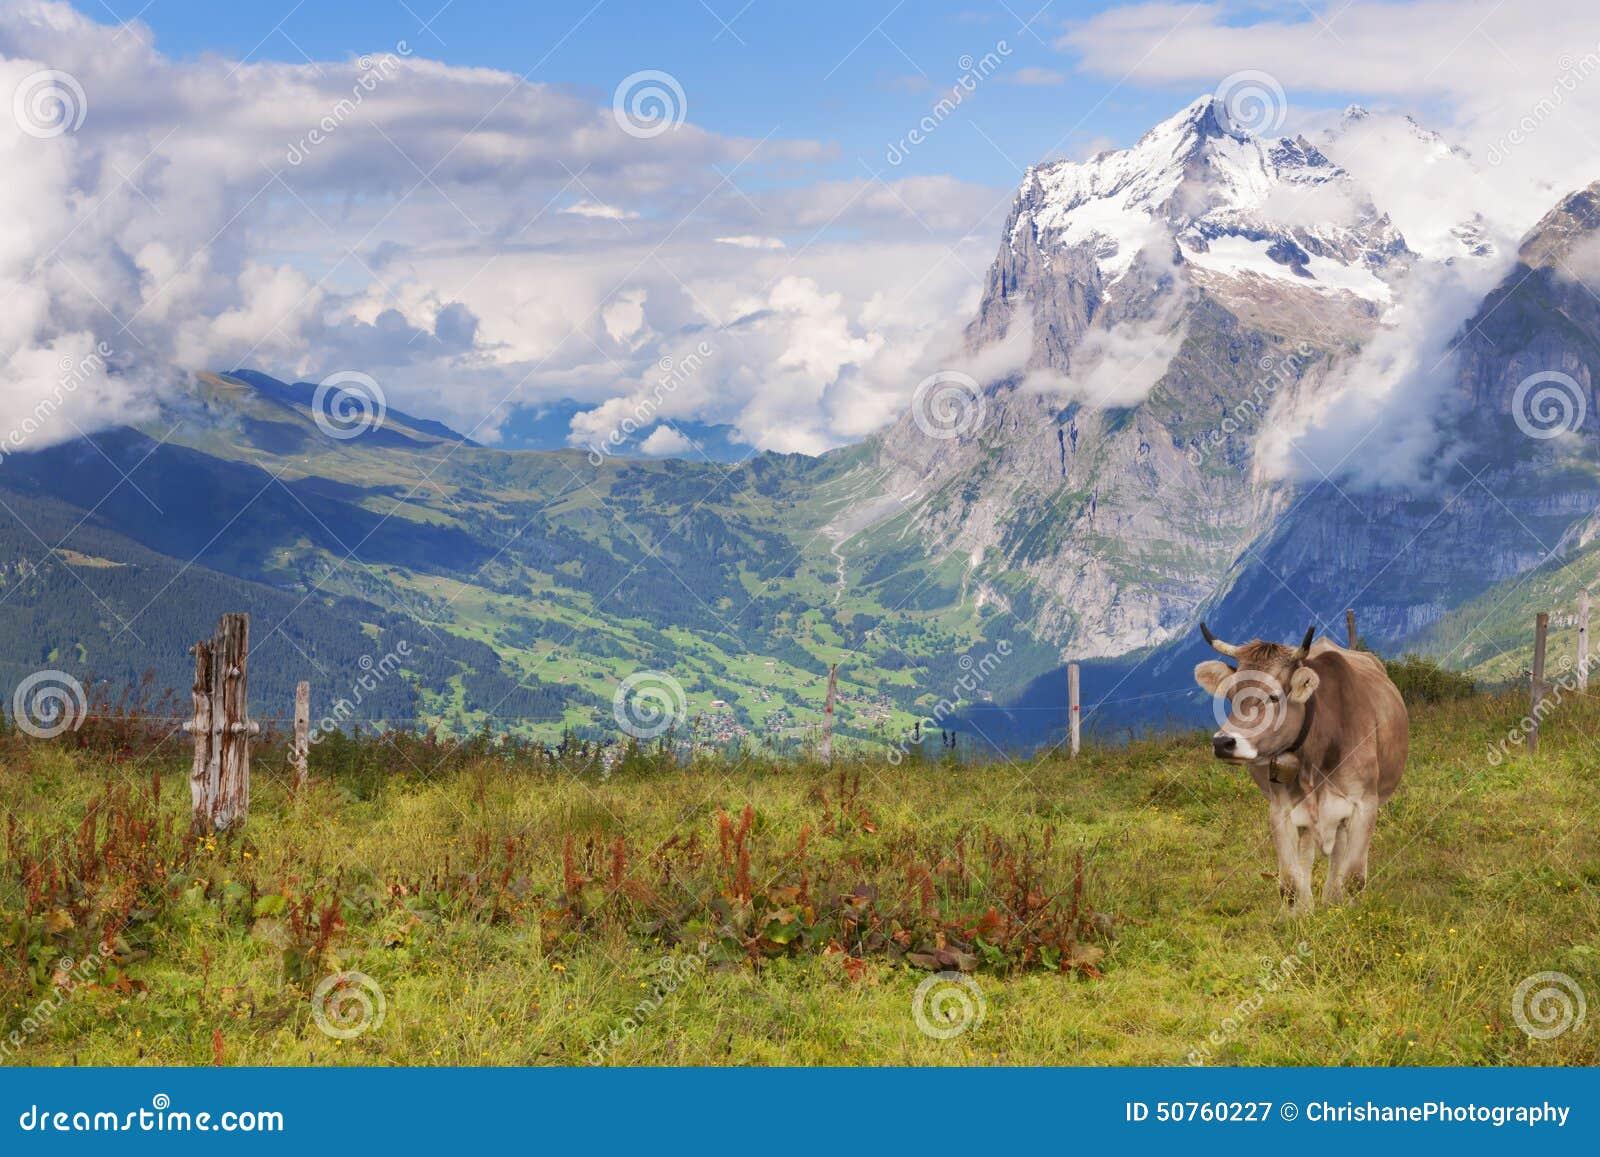 Schreckhorn, взгляды, и швейцарская корова